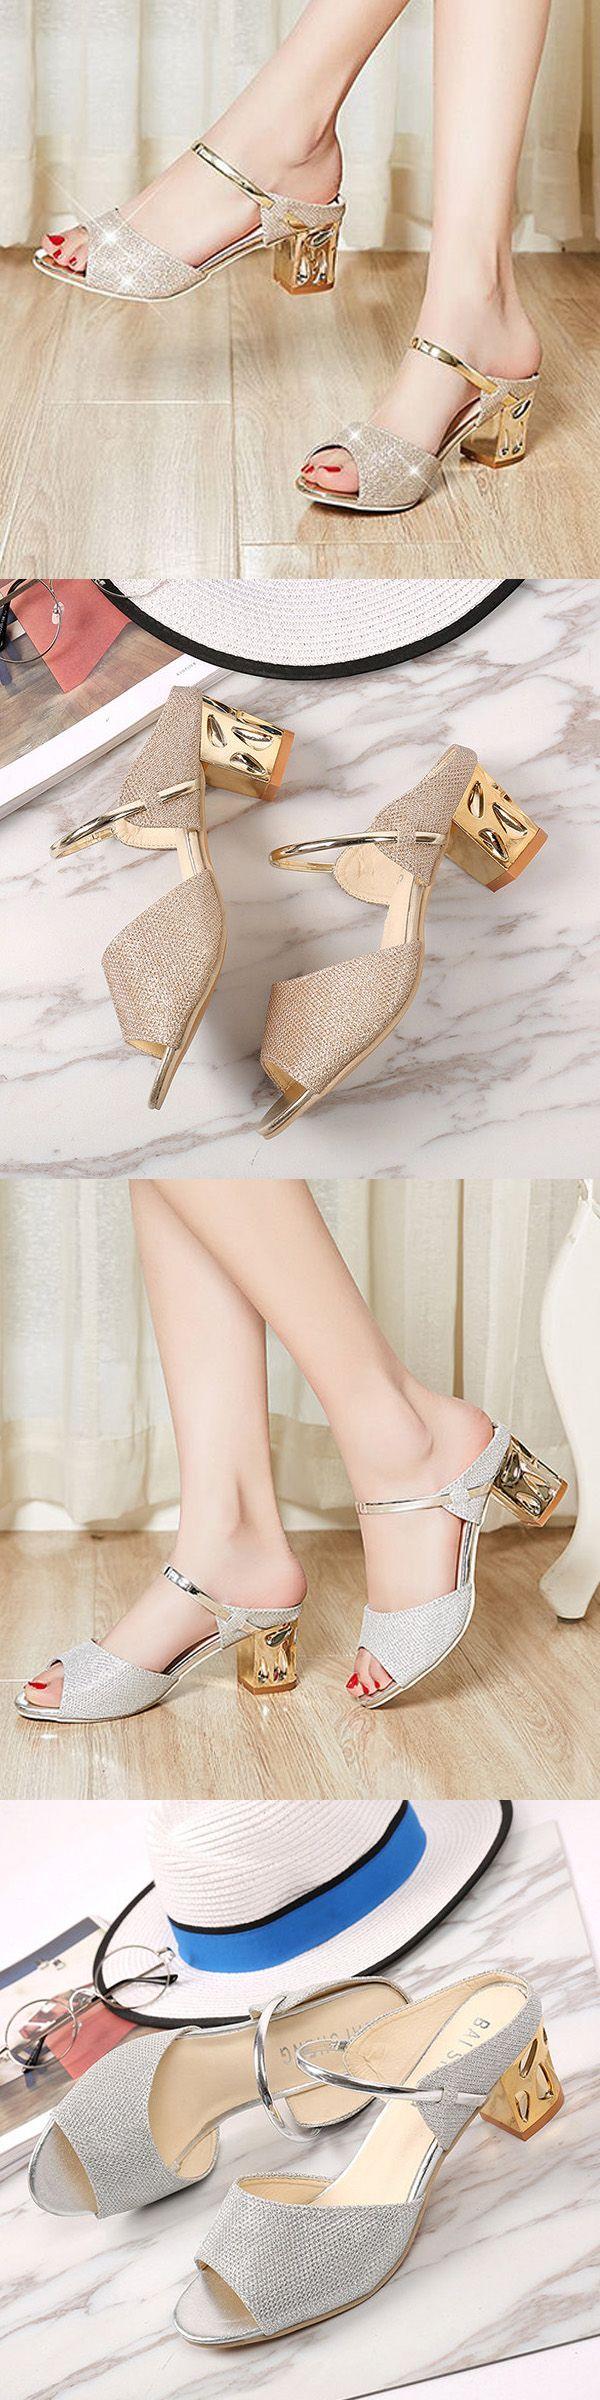 US$15.05 Shiny Peep Toe Metal Block Sandals For Women_Golden Elegant Sandals_Silver Sandals Heels